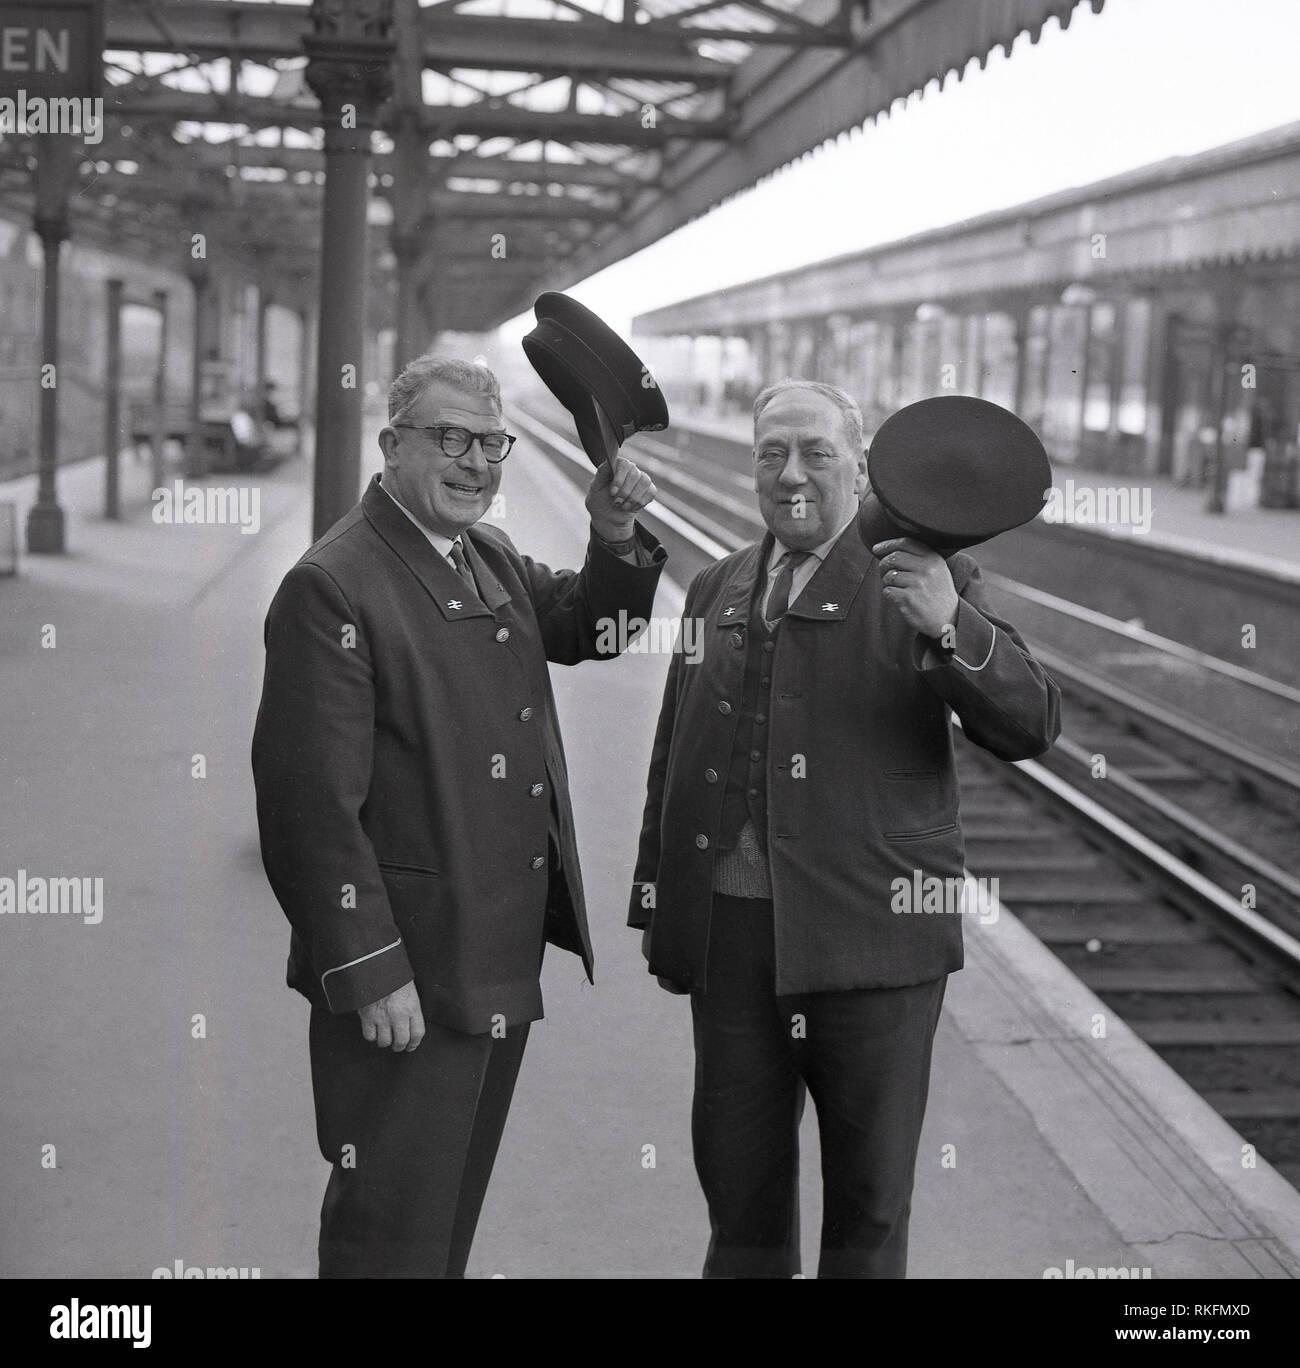 1968, two cheerful uniformed British Rail staff, a station foreman and ticket collector, standing on the platform at Blackheath railway station, raising their caps, Blackheath, London, England, UK. Stock Photo